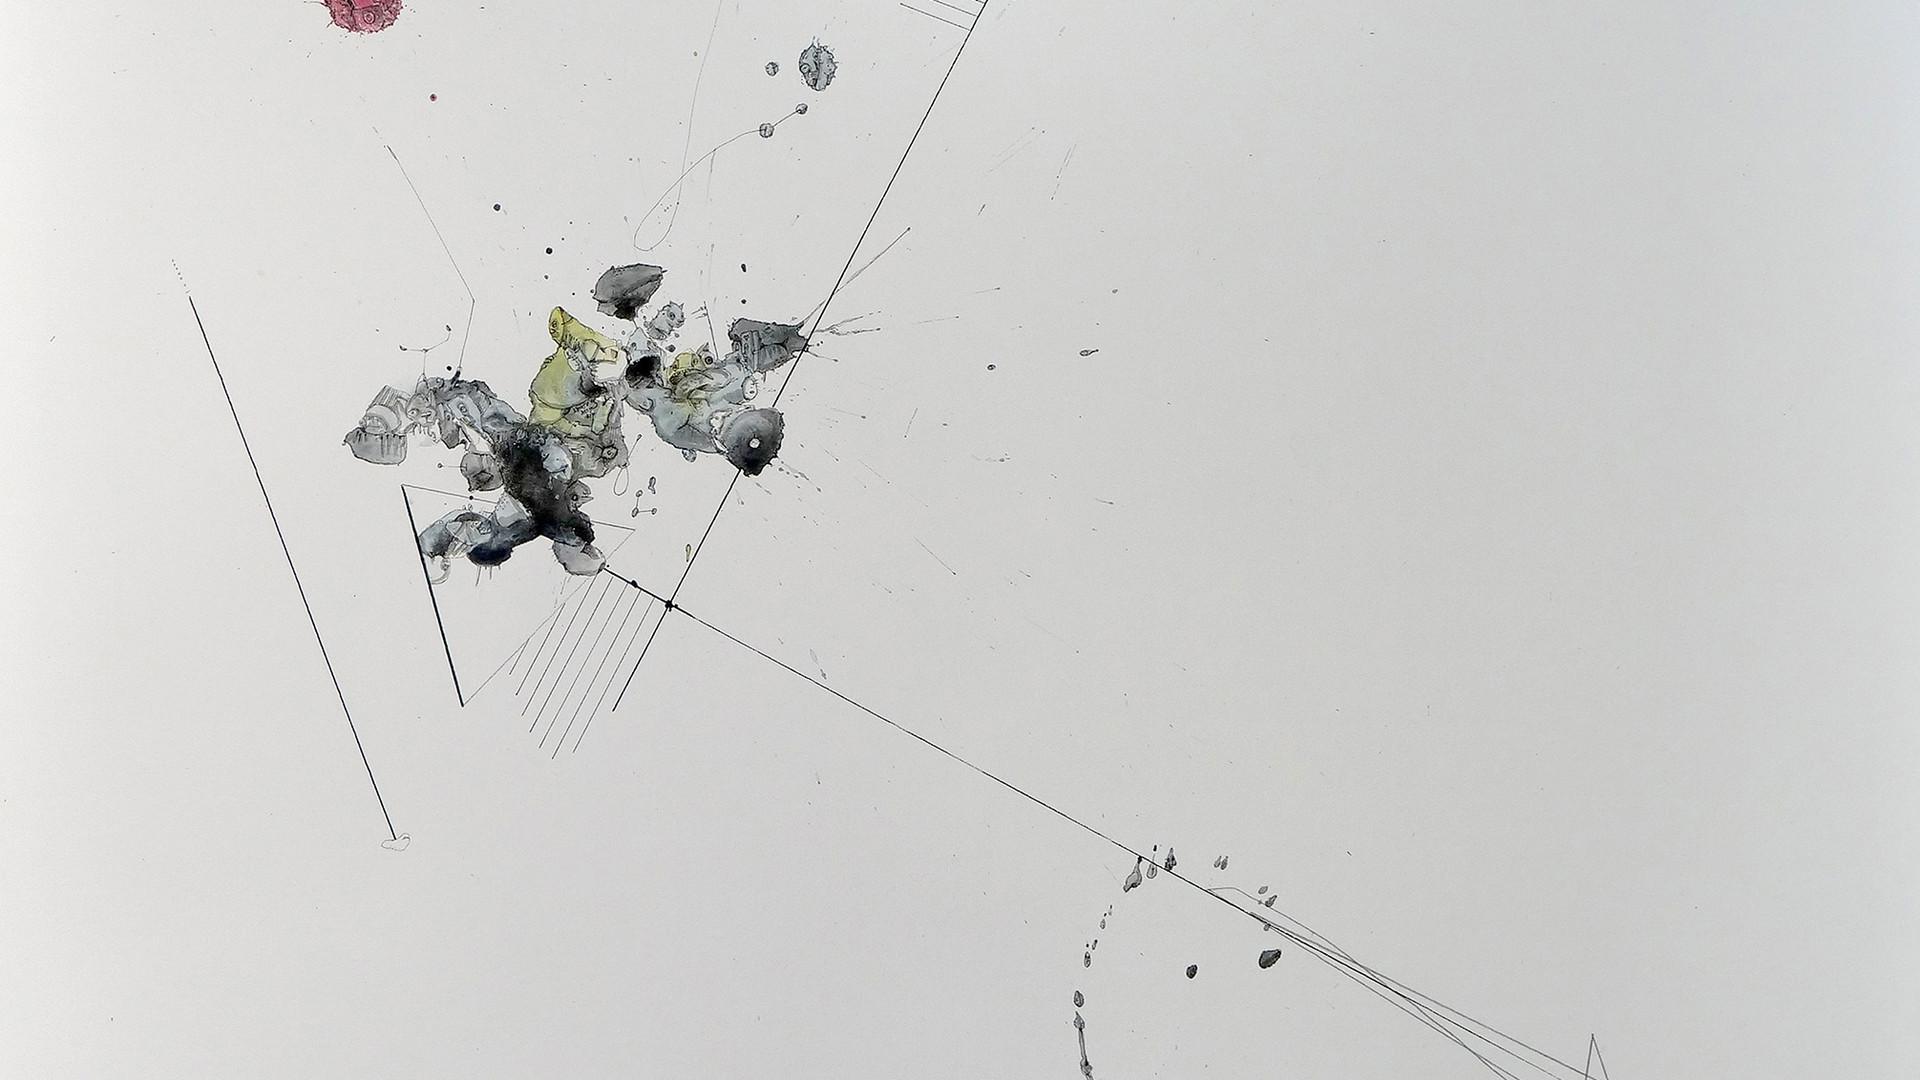 Peer Kriesel Weiße Balance III 2018 Aquarell, Acryl, Pigmenttusche auf Papier 100 x 70 cm